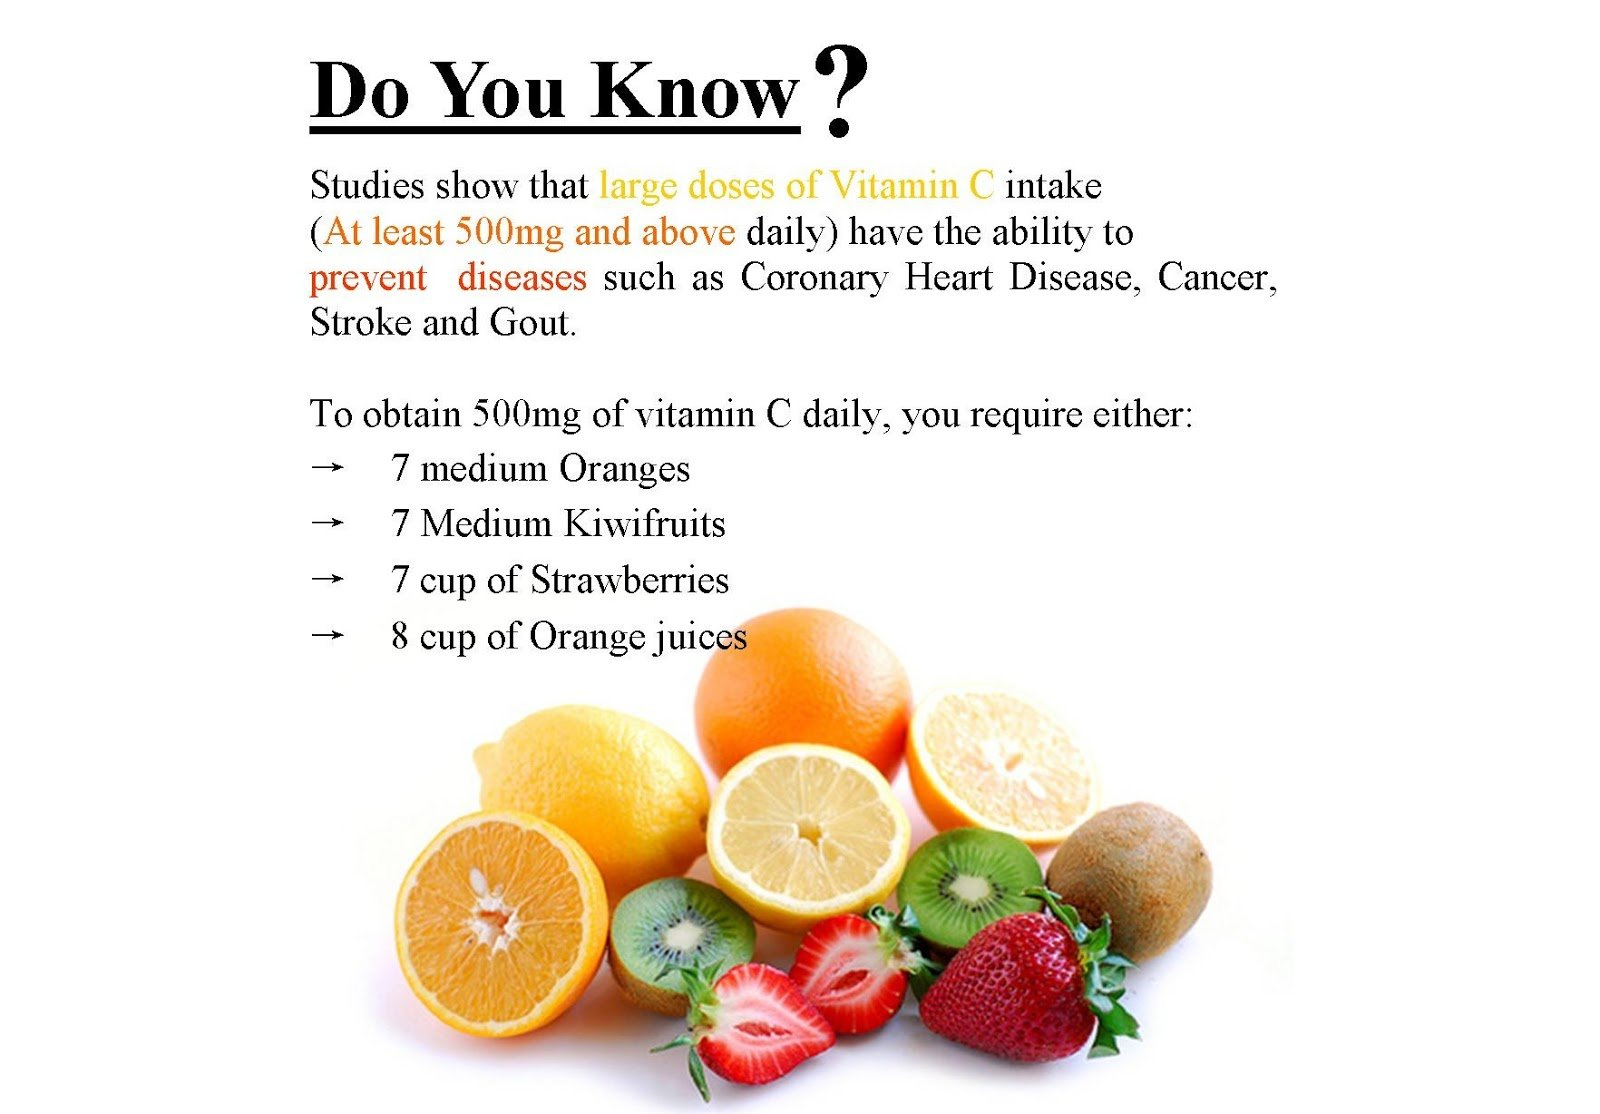 Vitamin C deficiency lowers serotonin levels and creates neurological damage.